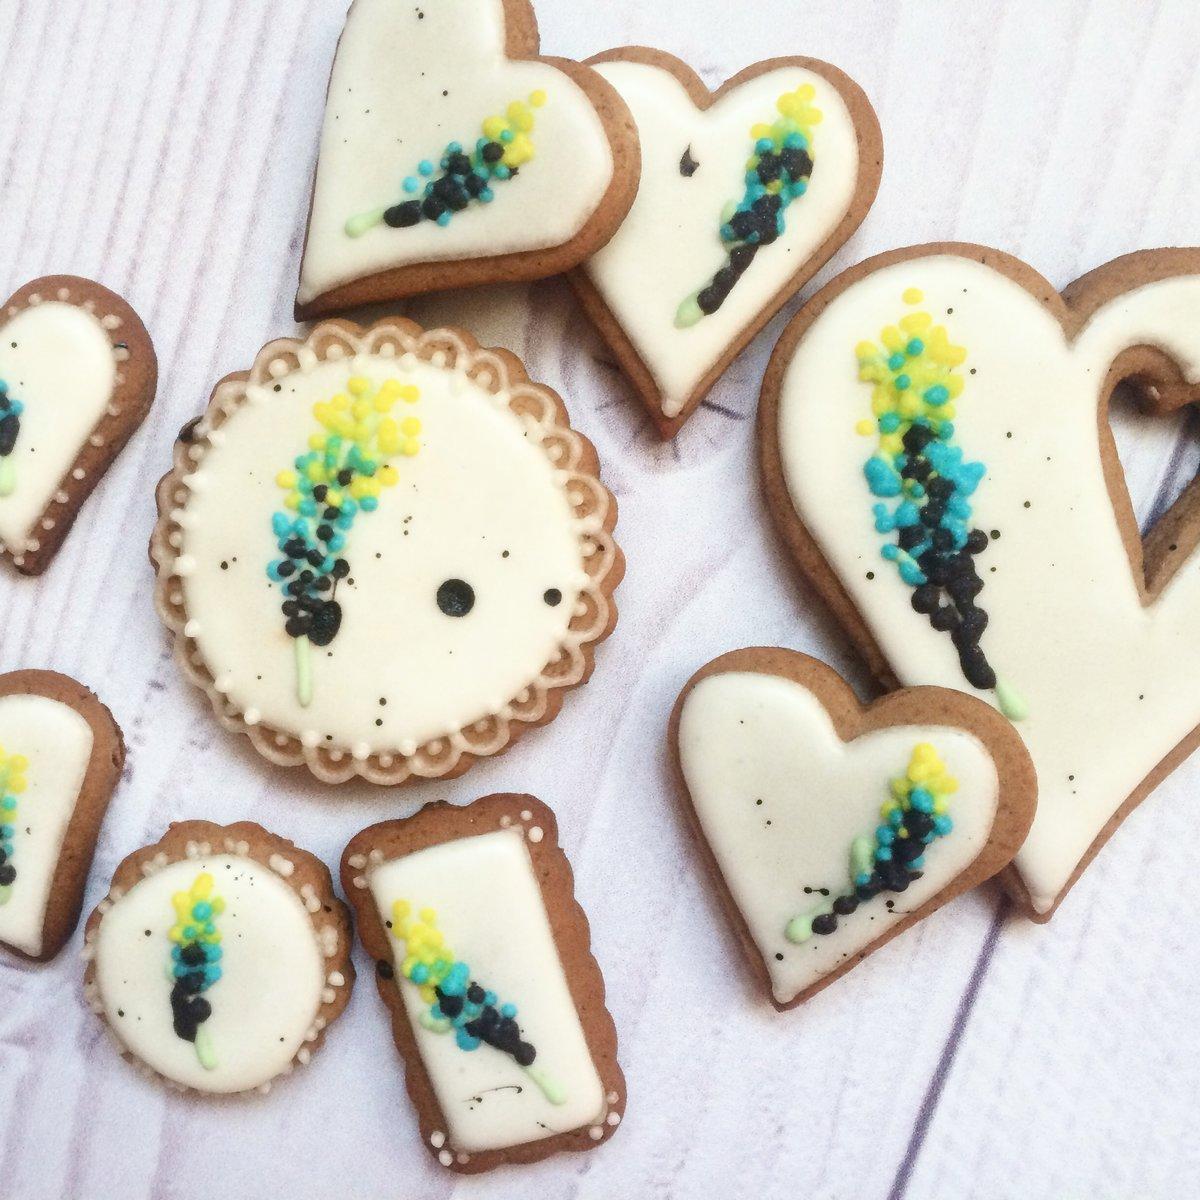 Имбирное печенье на свадьбу.  Ginger biscuits for the wedding | shantilly